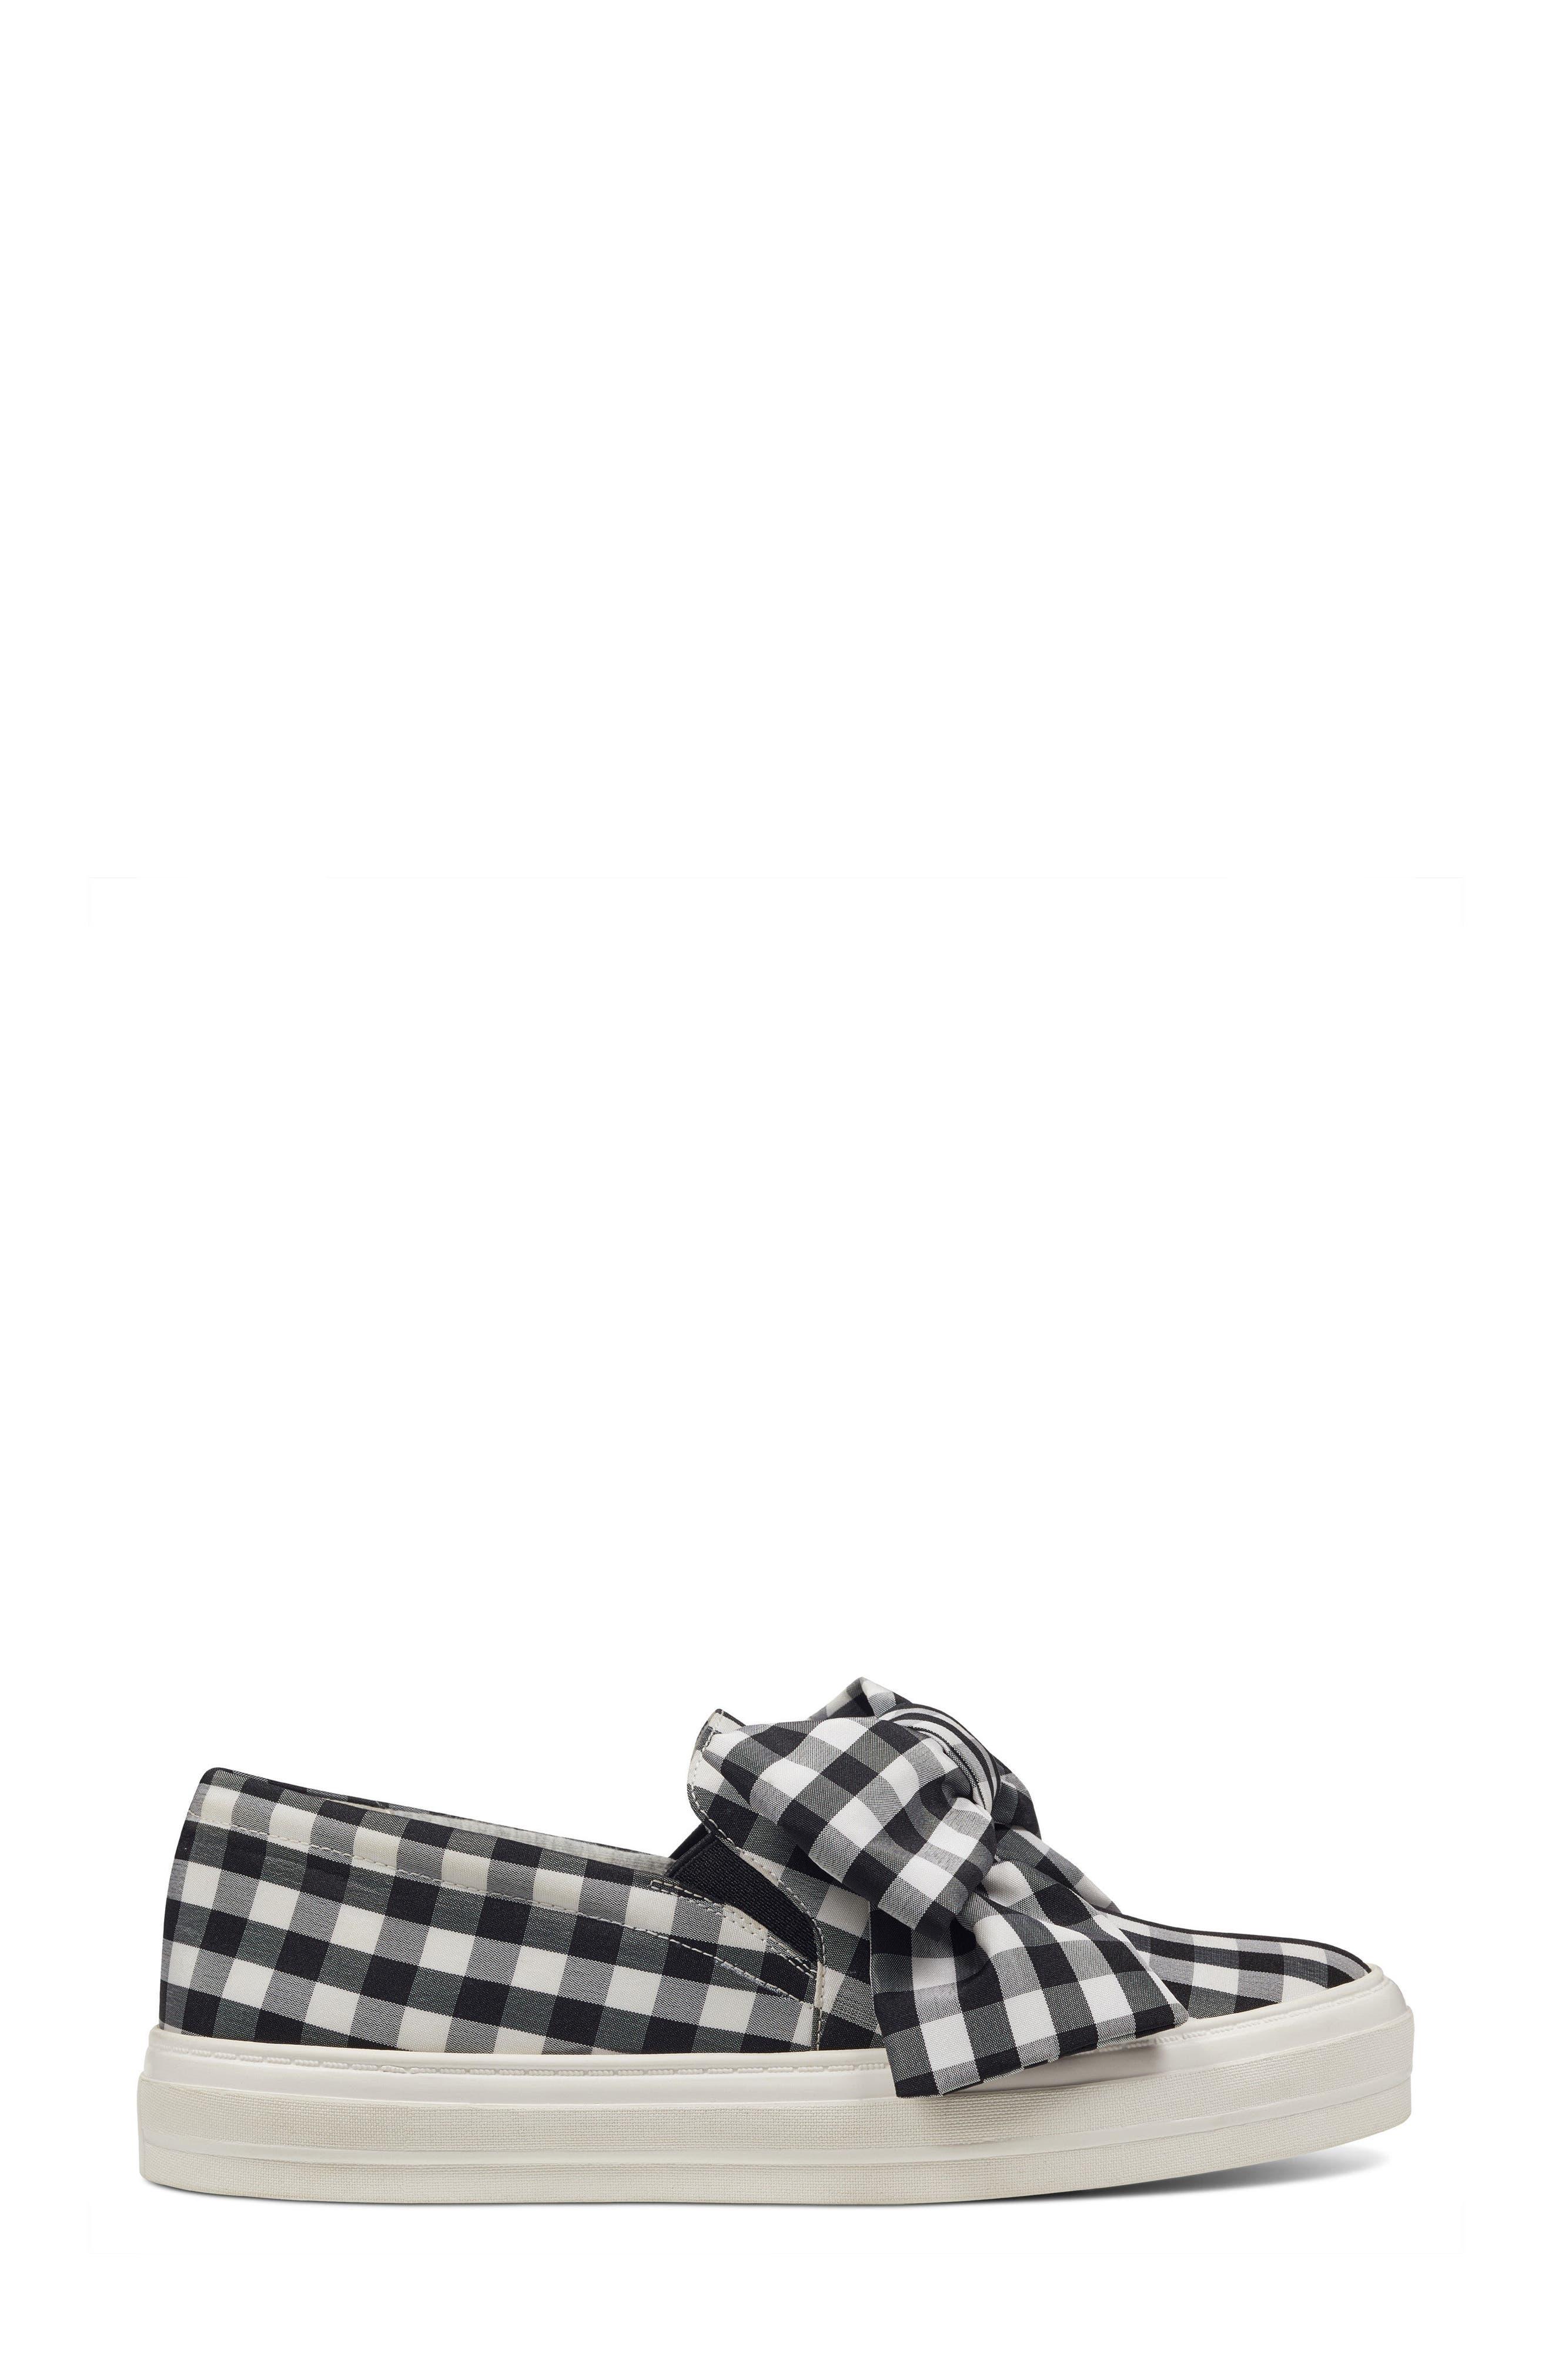 Onosha Bow Slip-On Sneaker,                             Alternate thumbnail 3, color,                             Black/ White Fabric